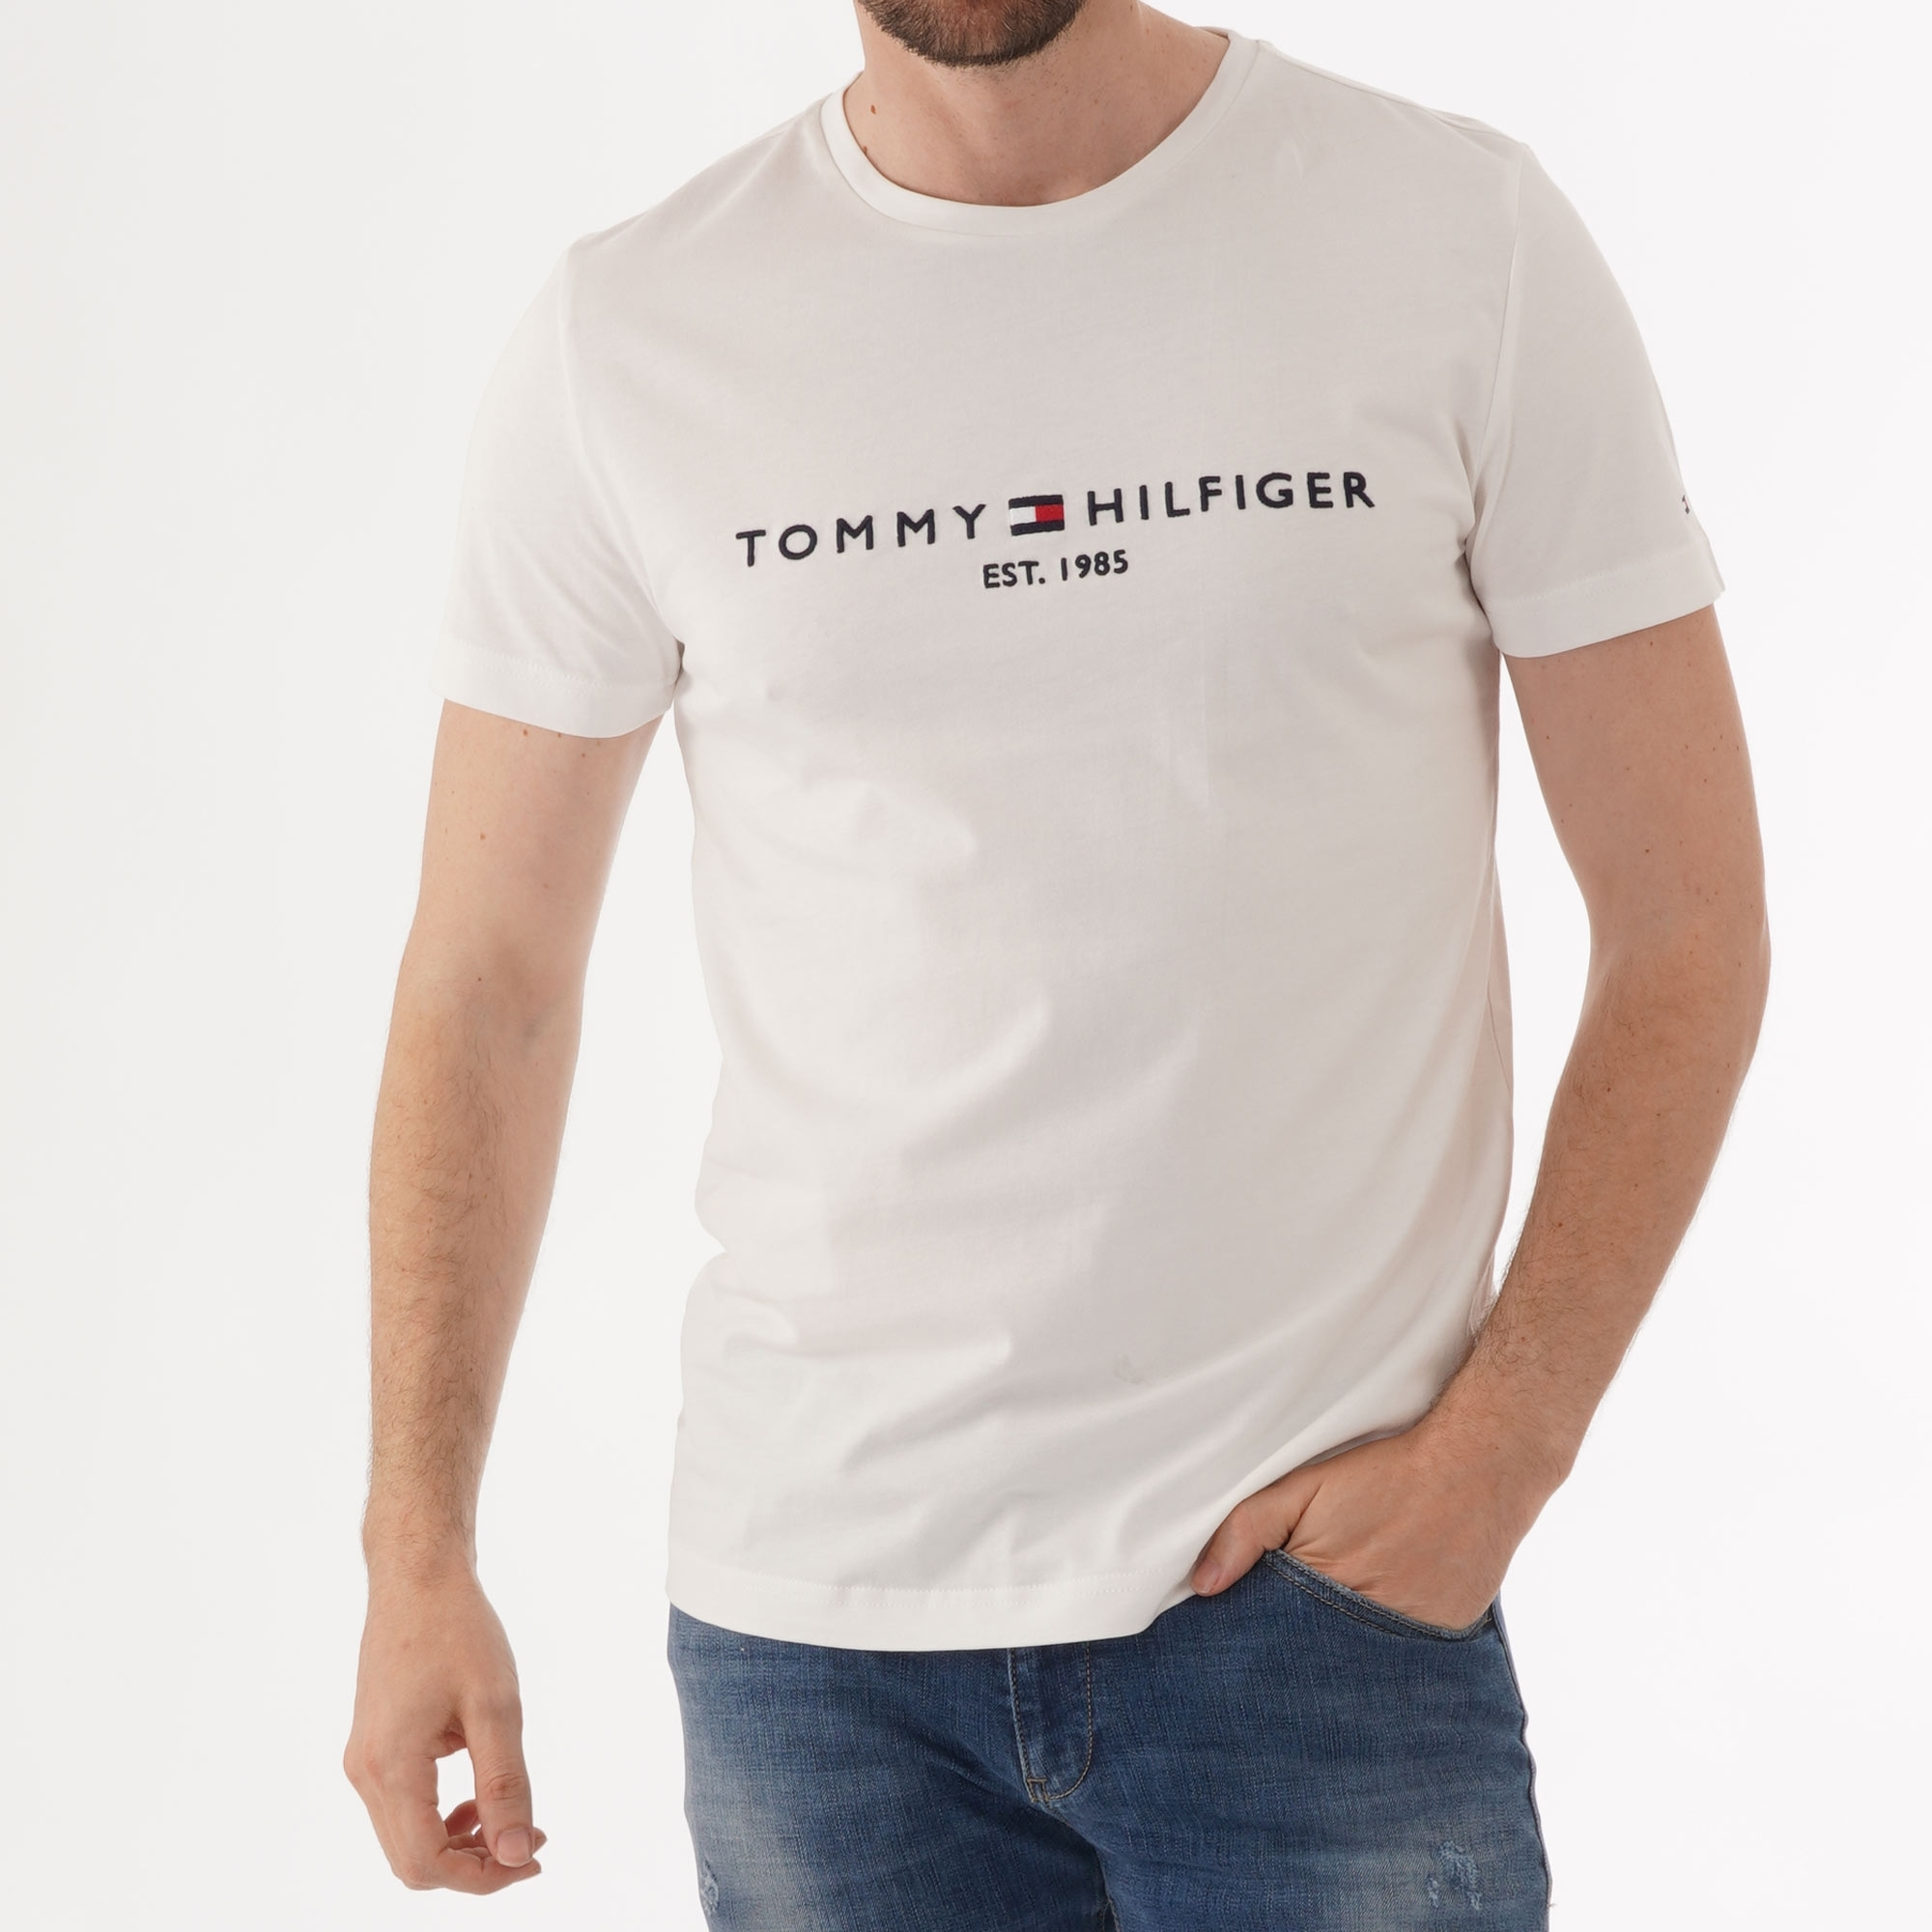 tommy hilfiger white t